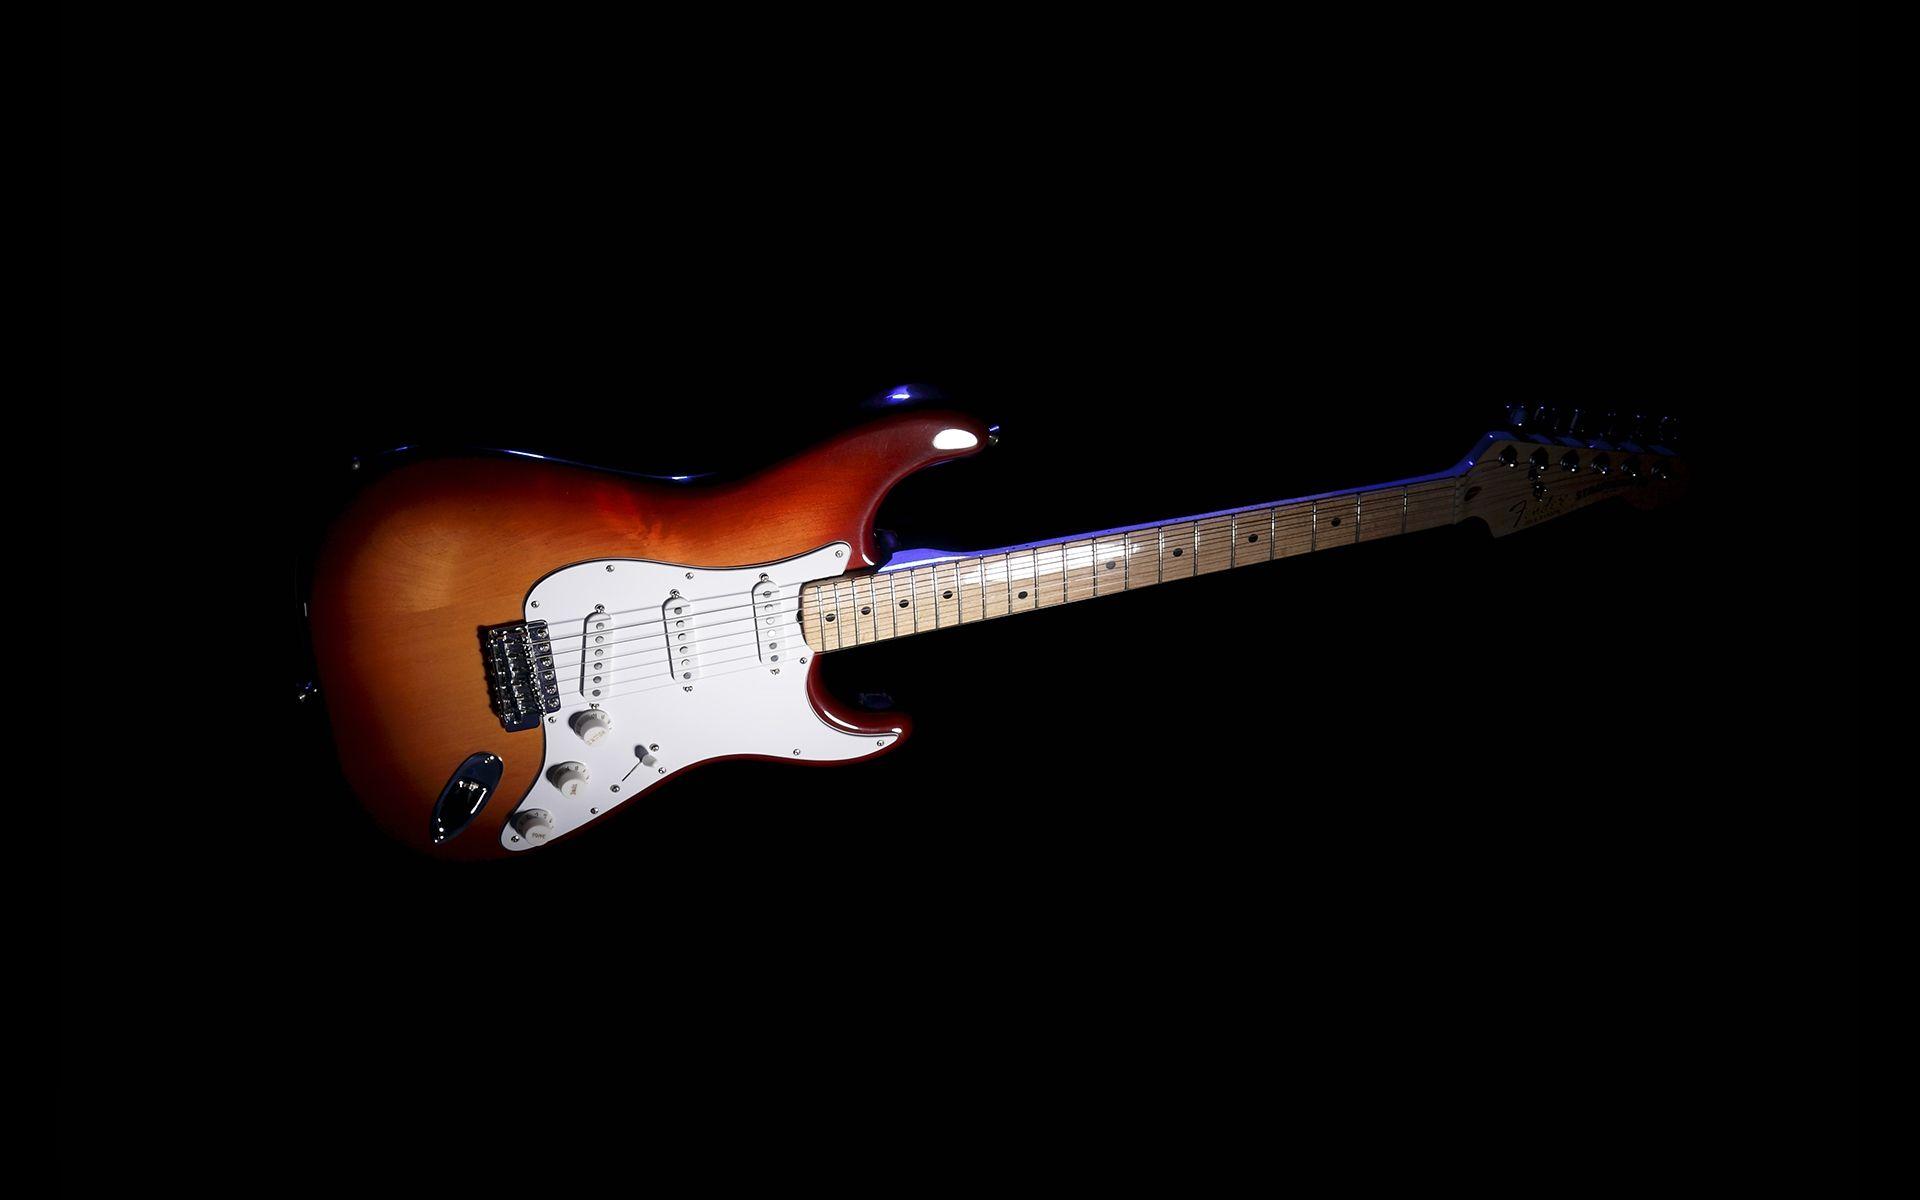 Fender Guitar, Wallpaper Image